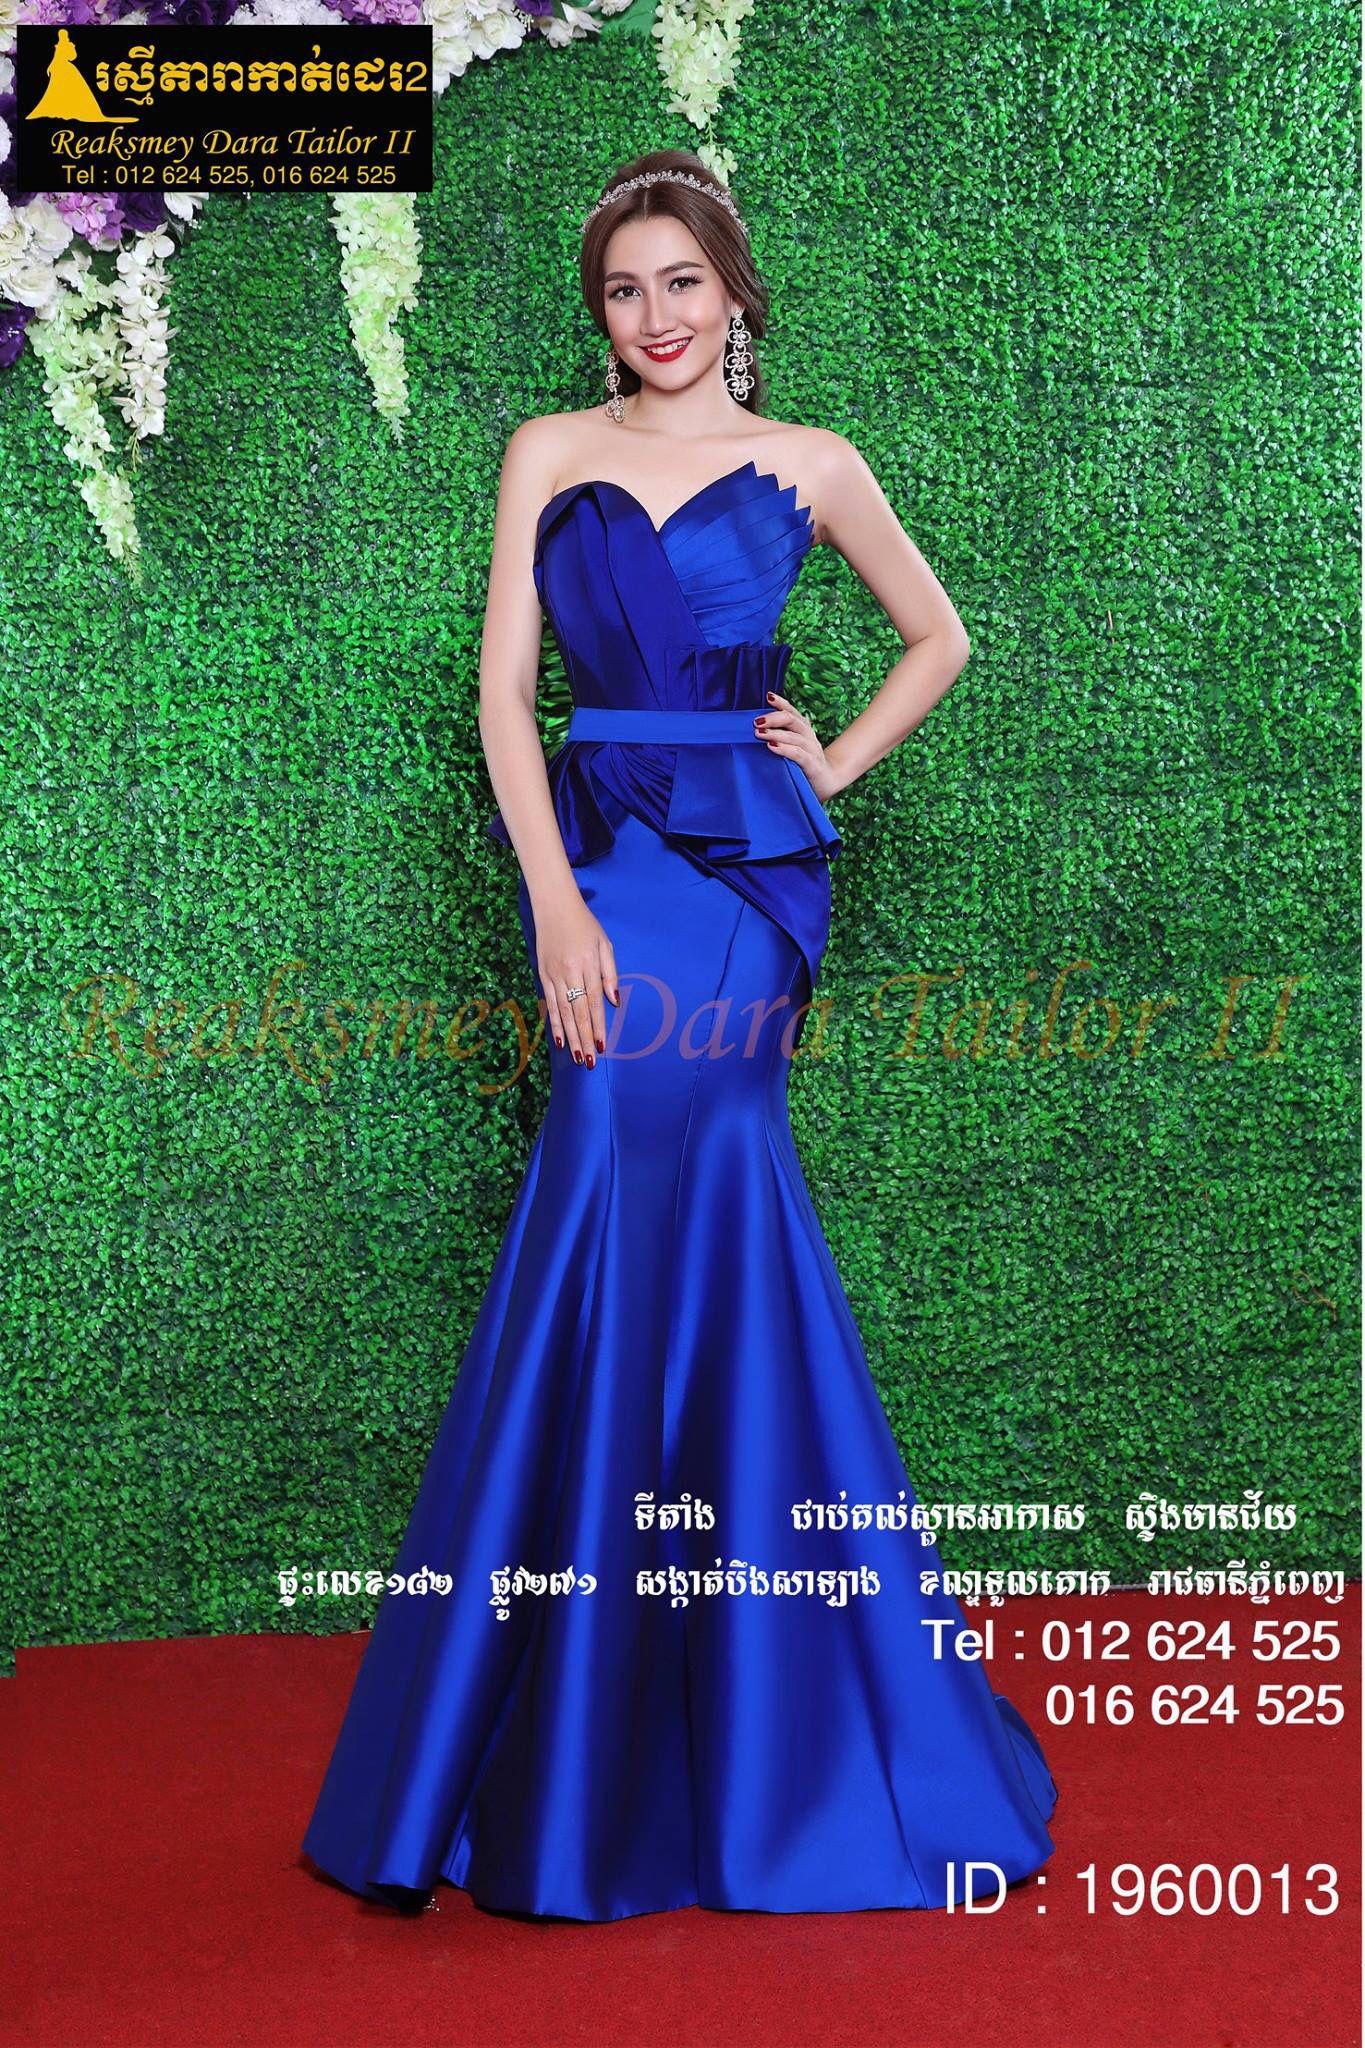 Cambodia dress Braids Maid Dresses Peplum Dresses Girls Dresses Thai Dress Royal